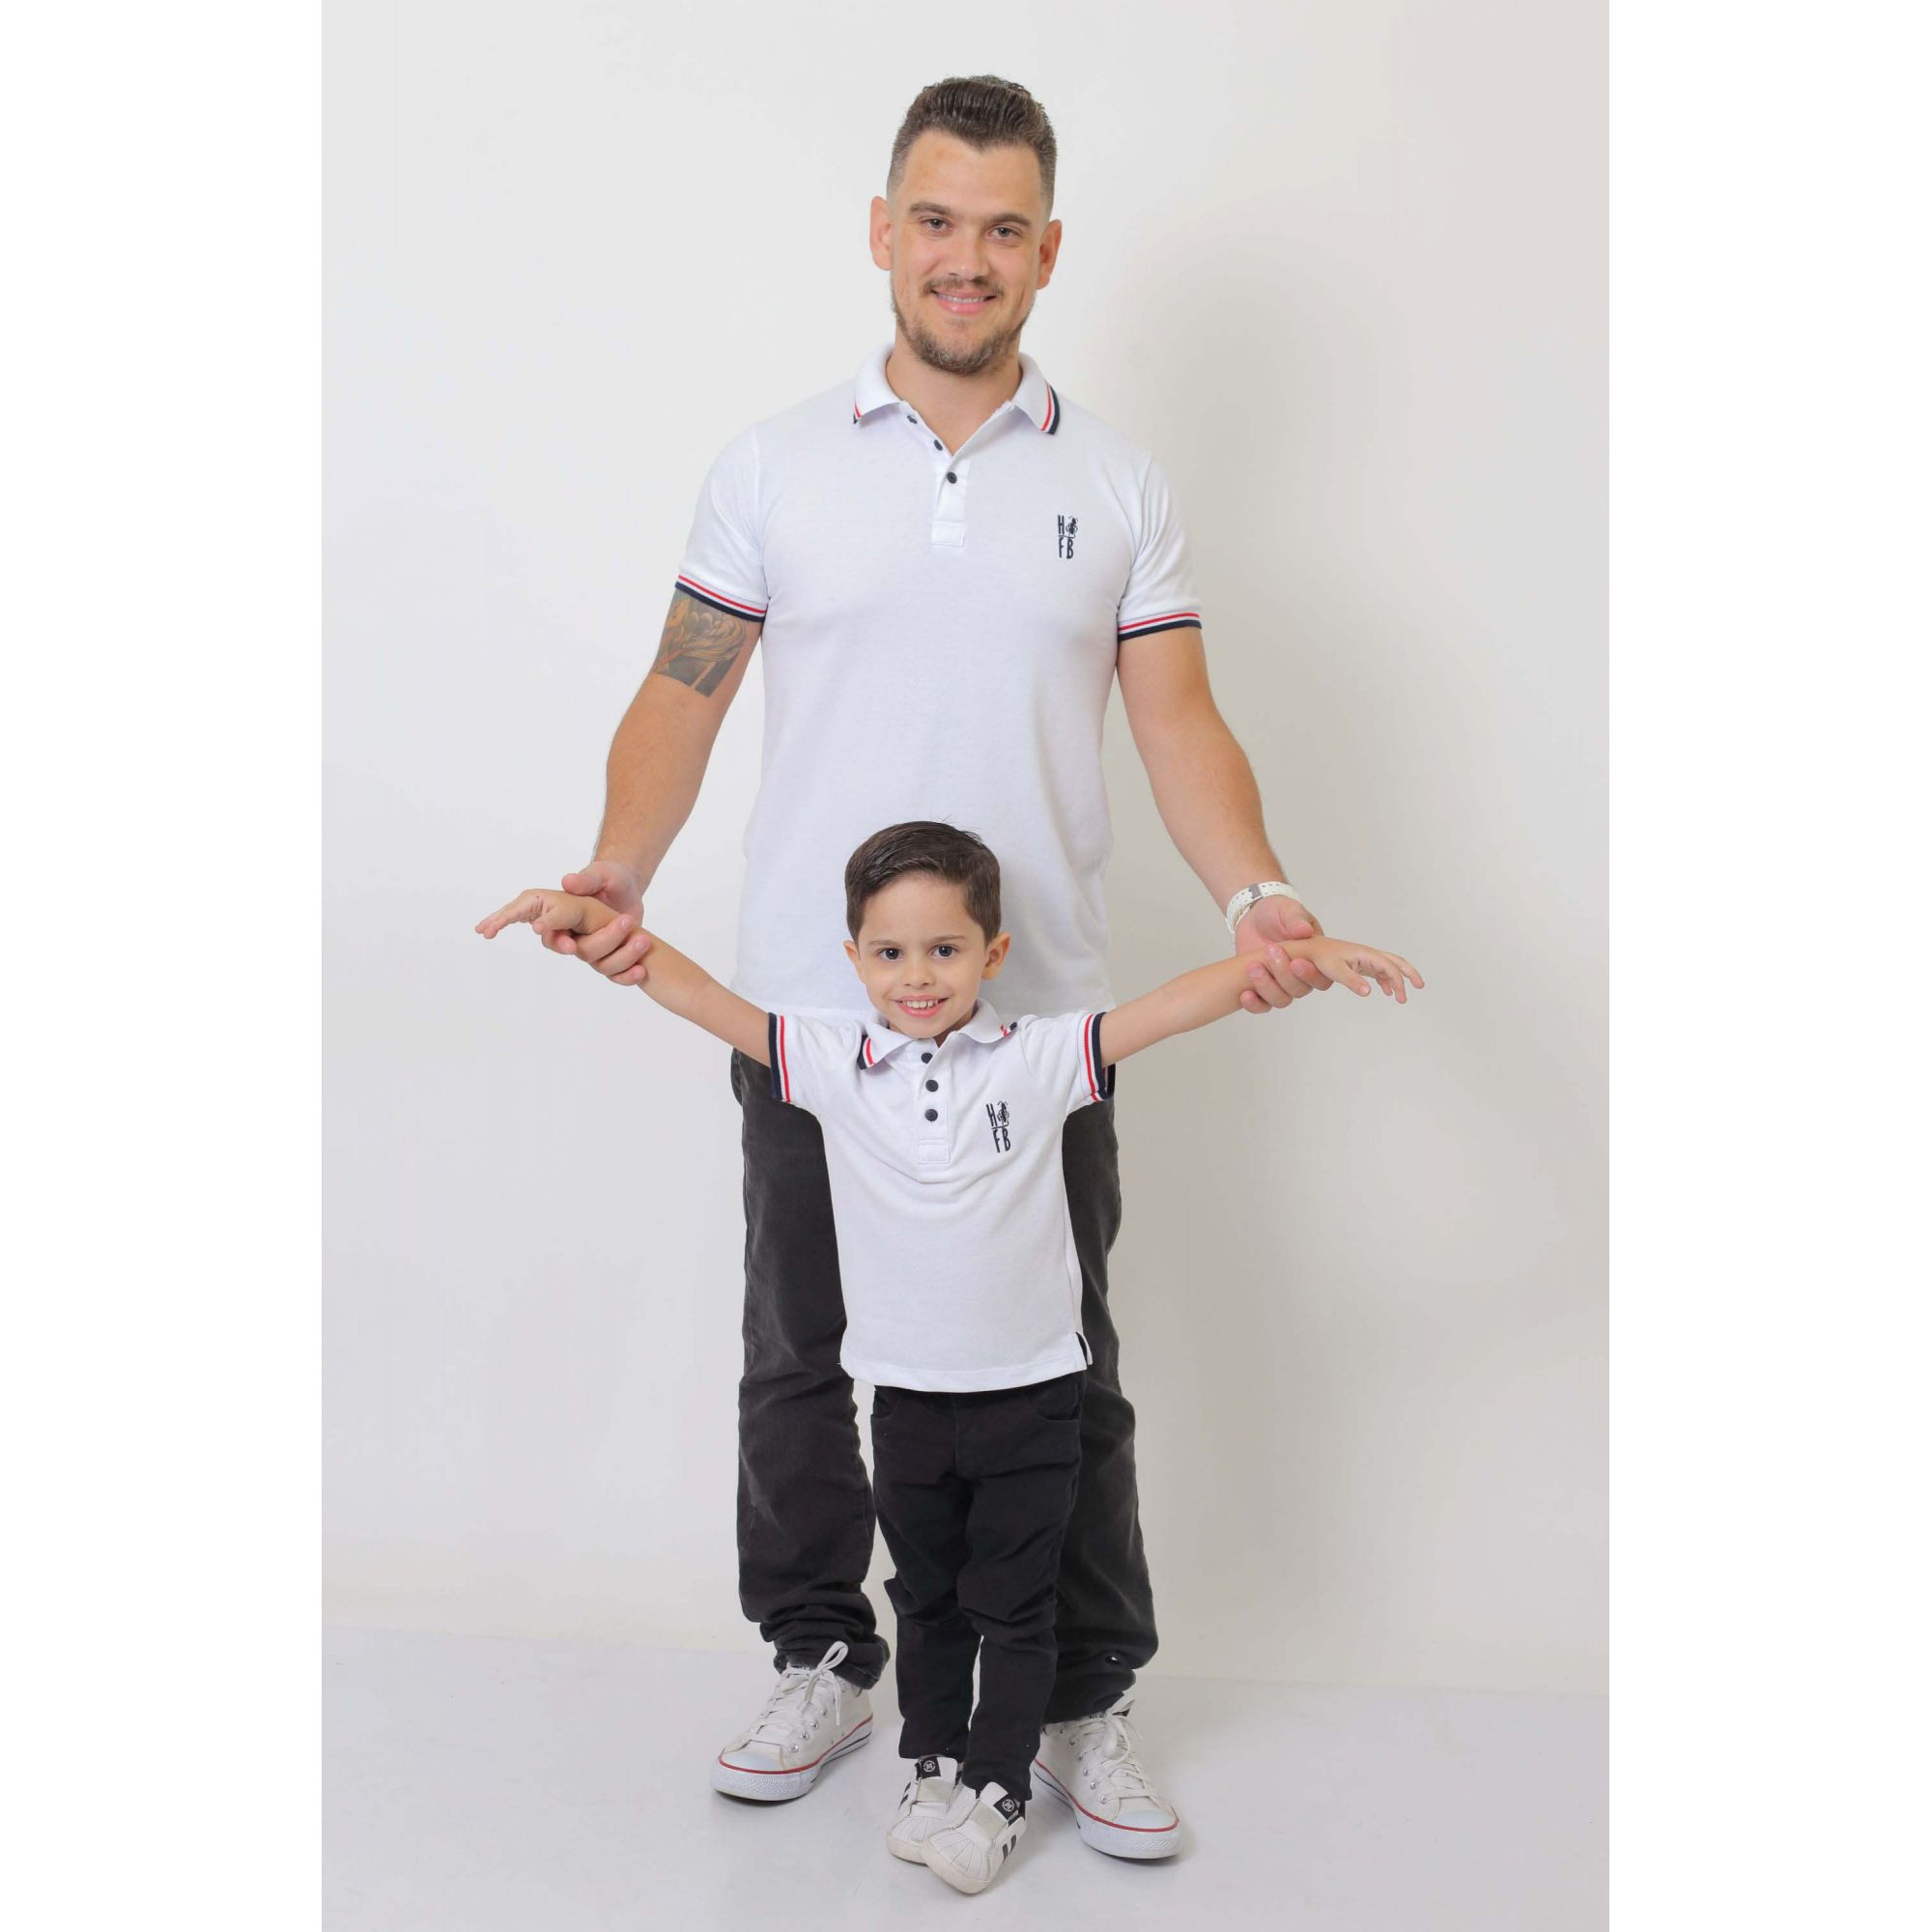 PAI E FILHO > Kit 02 Camisas ou Body Polo Branca  [Coleção Tal Pai Tal Filho]